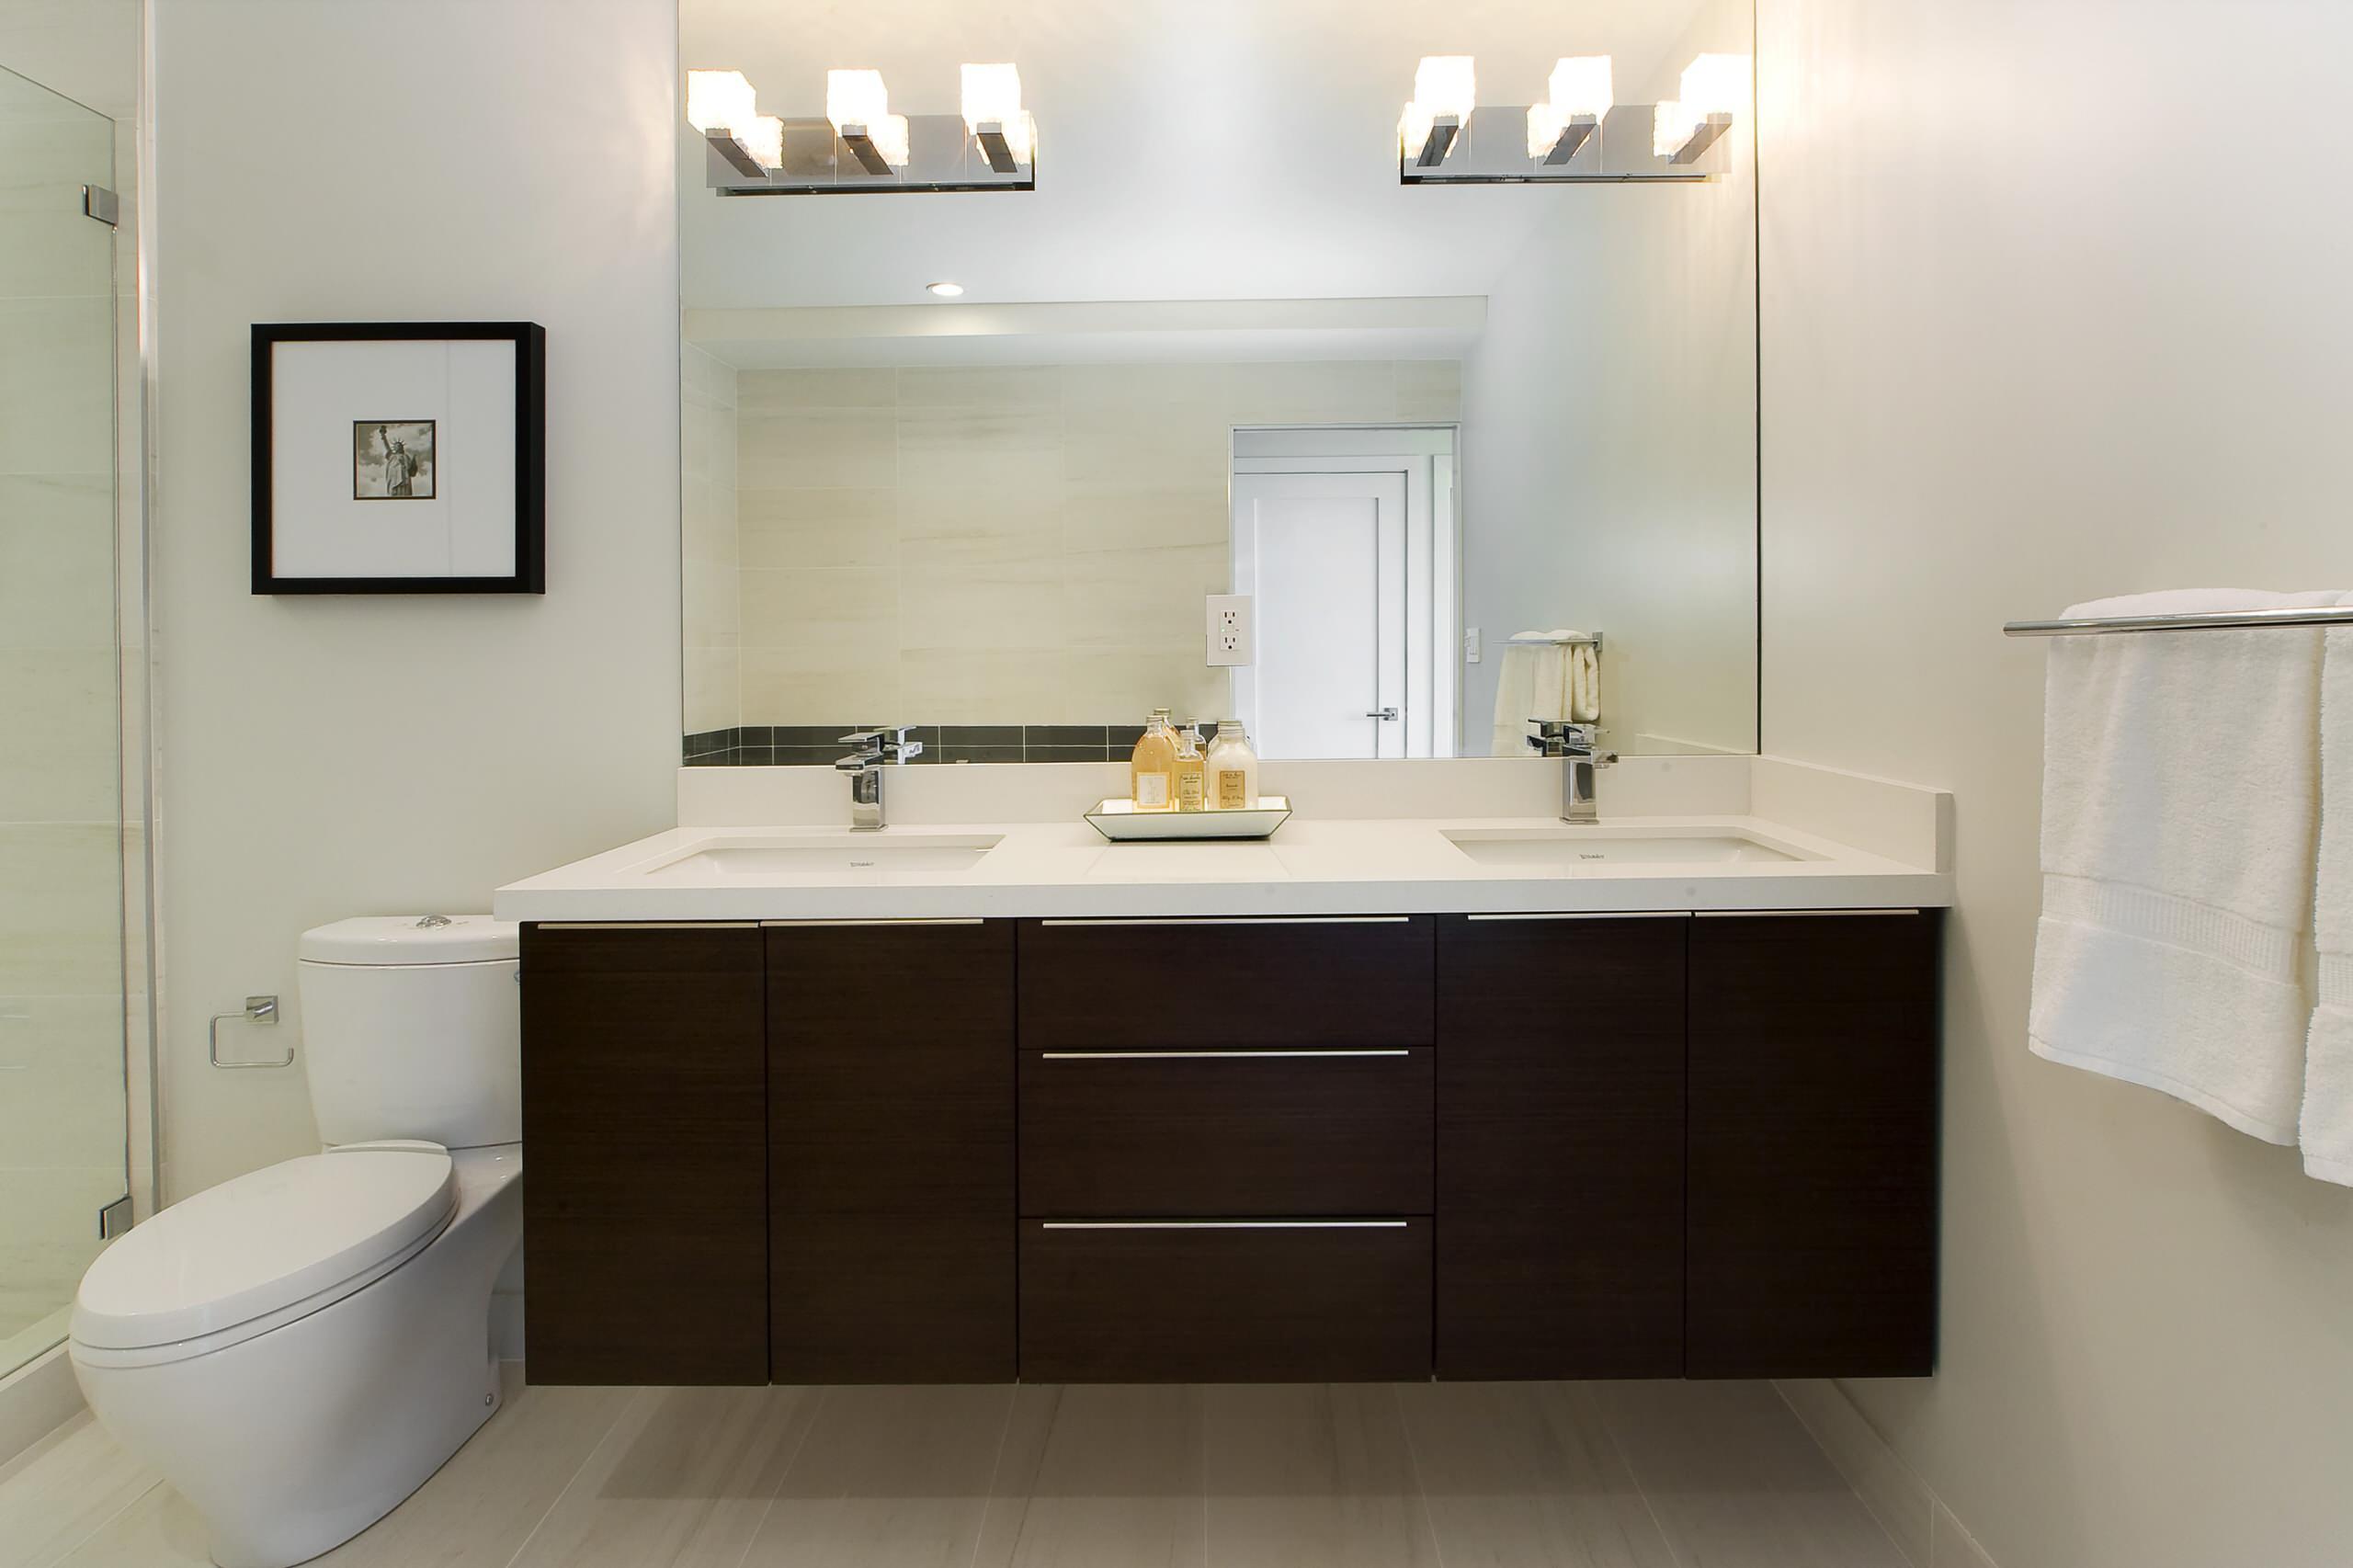 Bathrooms - Contemporary - Bathroom - Other - by Studio Marler | Houzz